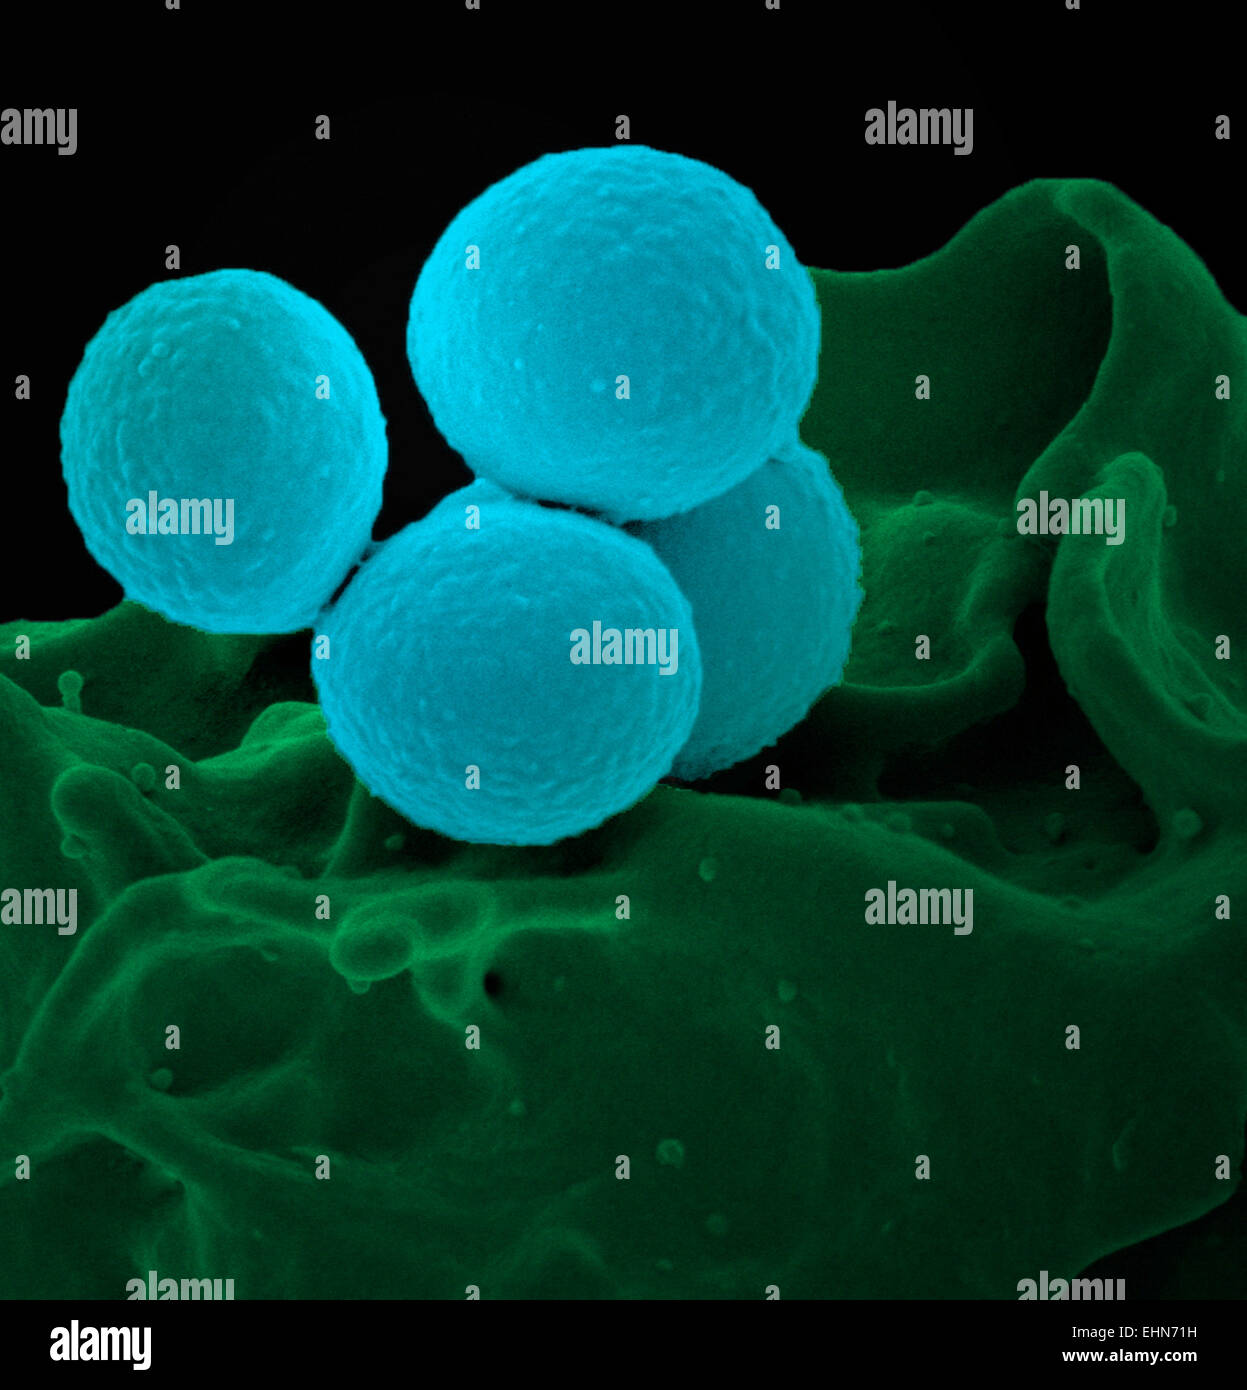 Coloured scanning electron micrograph (SEM) of methicillin-resistant Staphylococcus aureus (MRSA) bacteria. Stock Photo